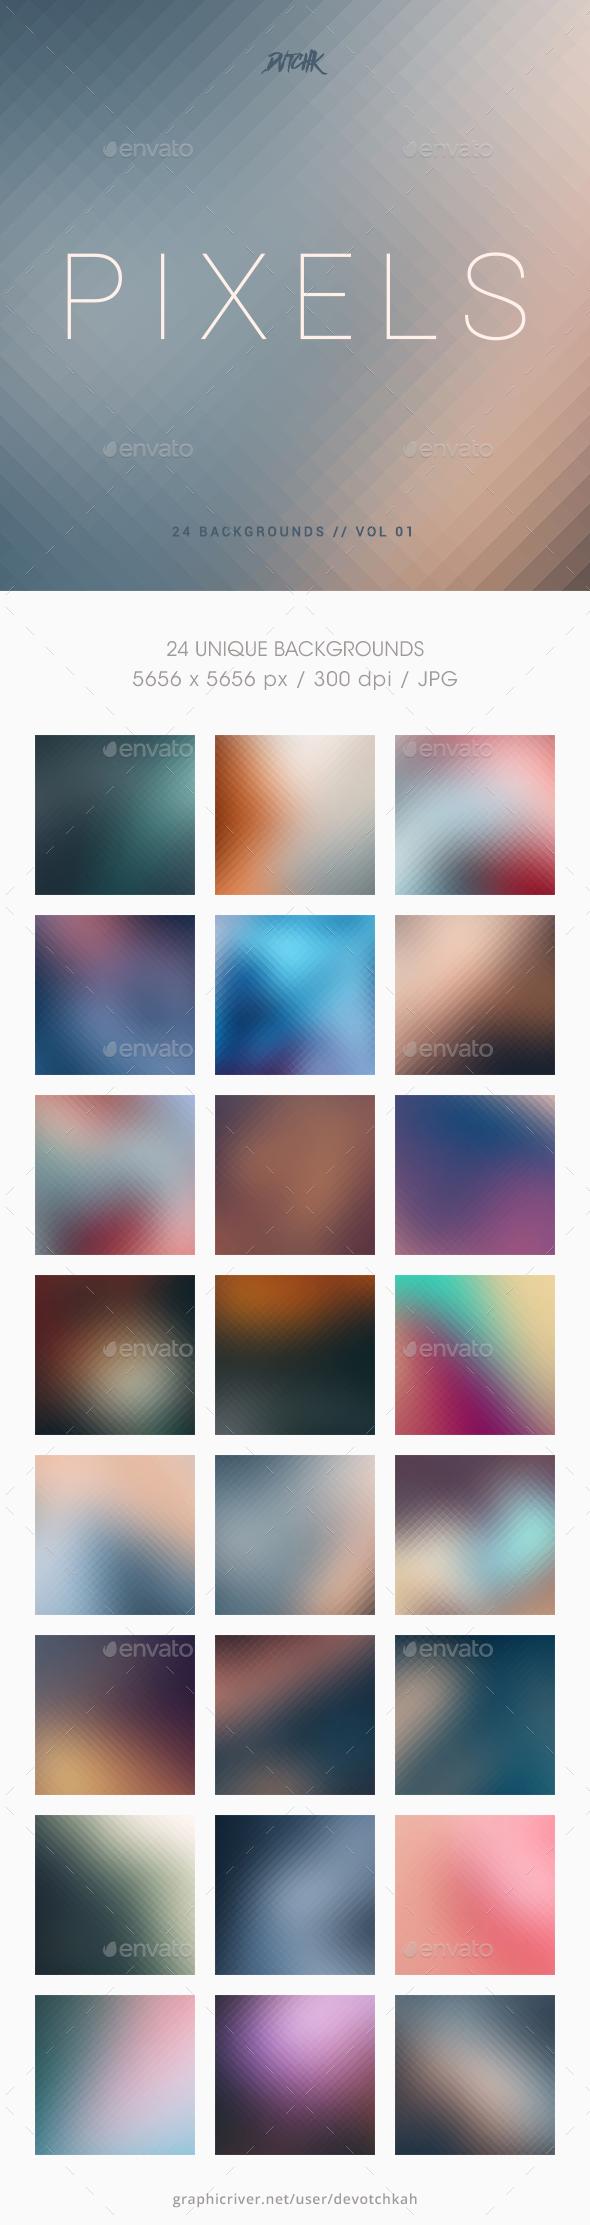 Pixels | Pixelated Backgrounds | Vol. 01 - Backgrounds Graphics